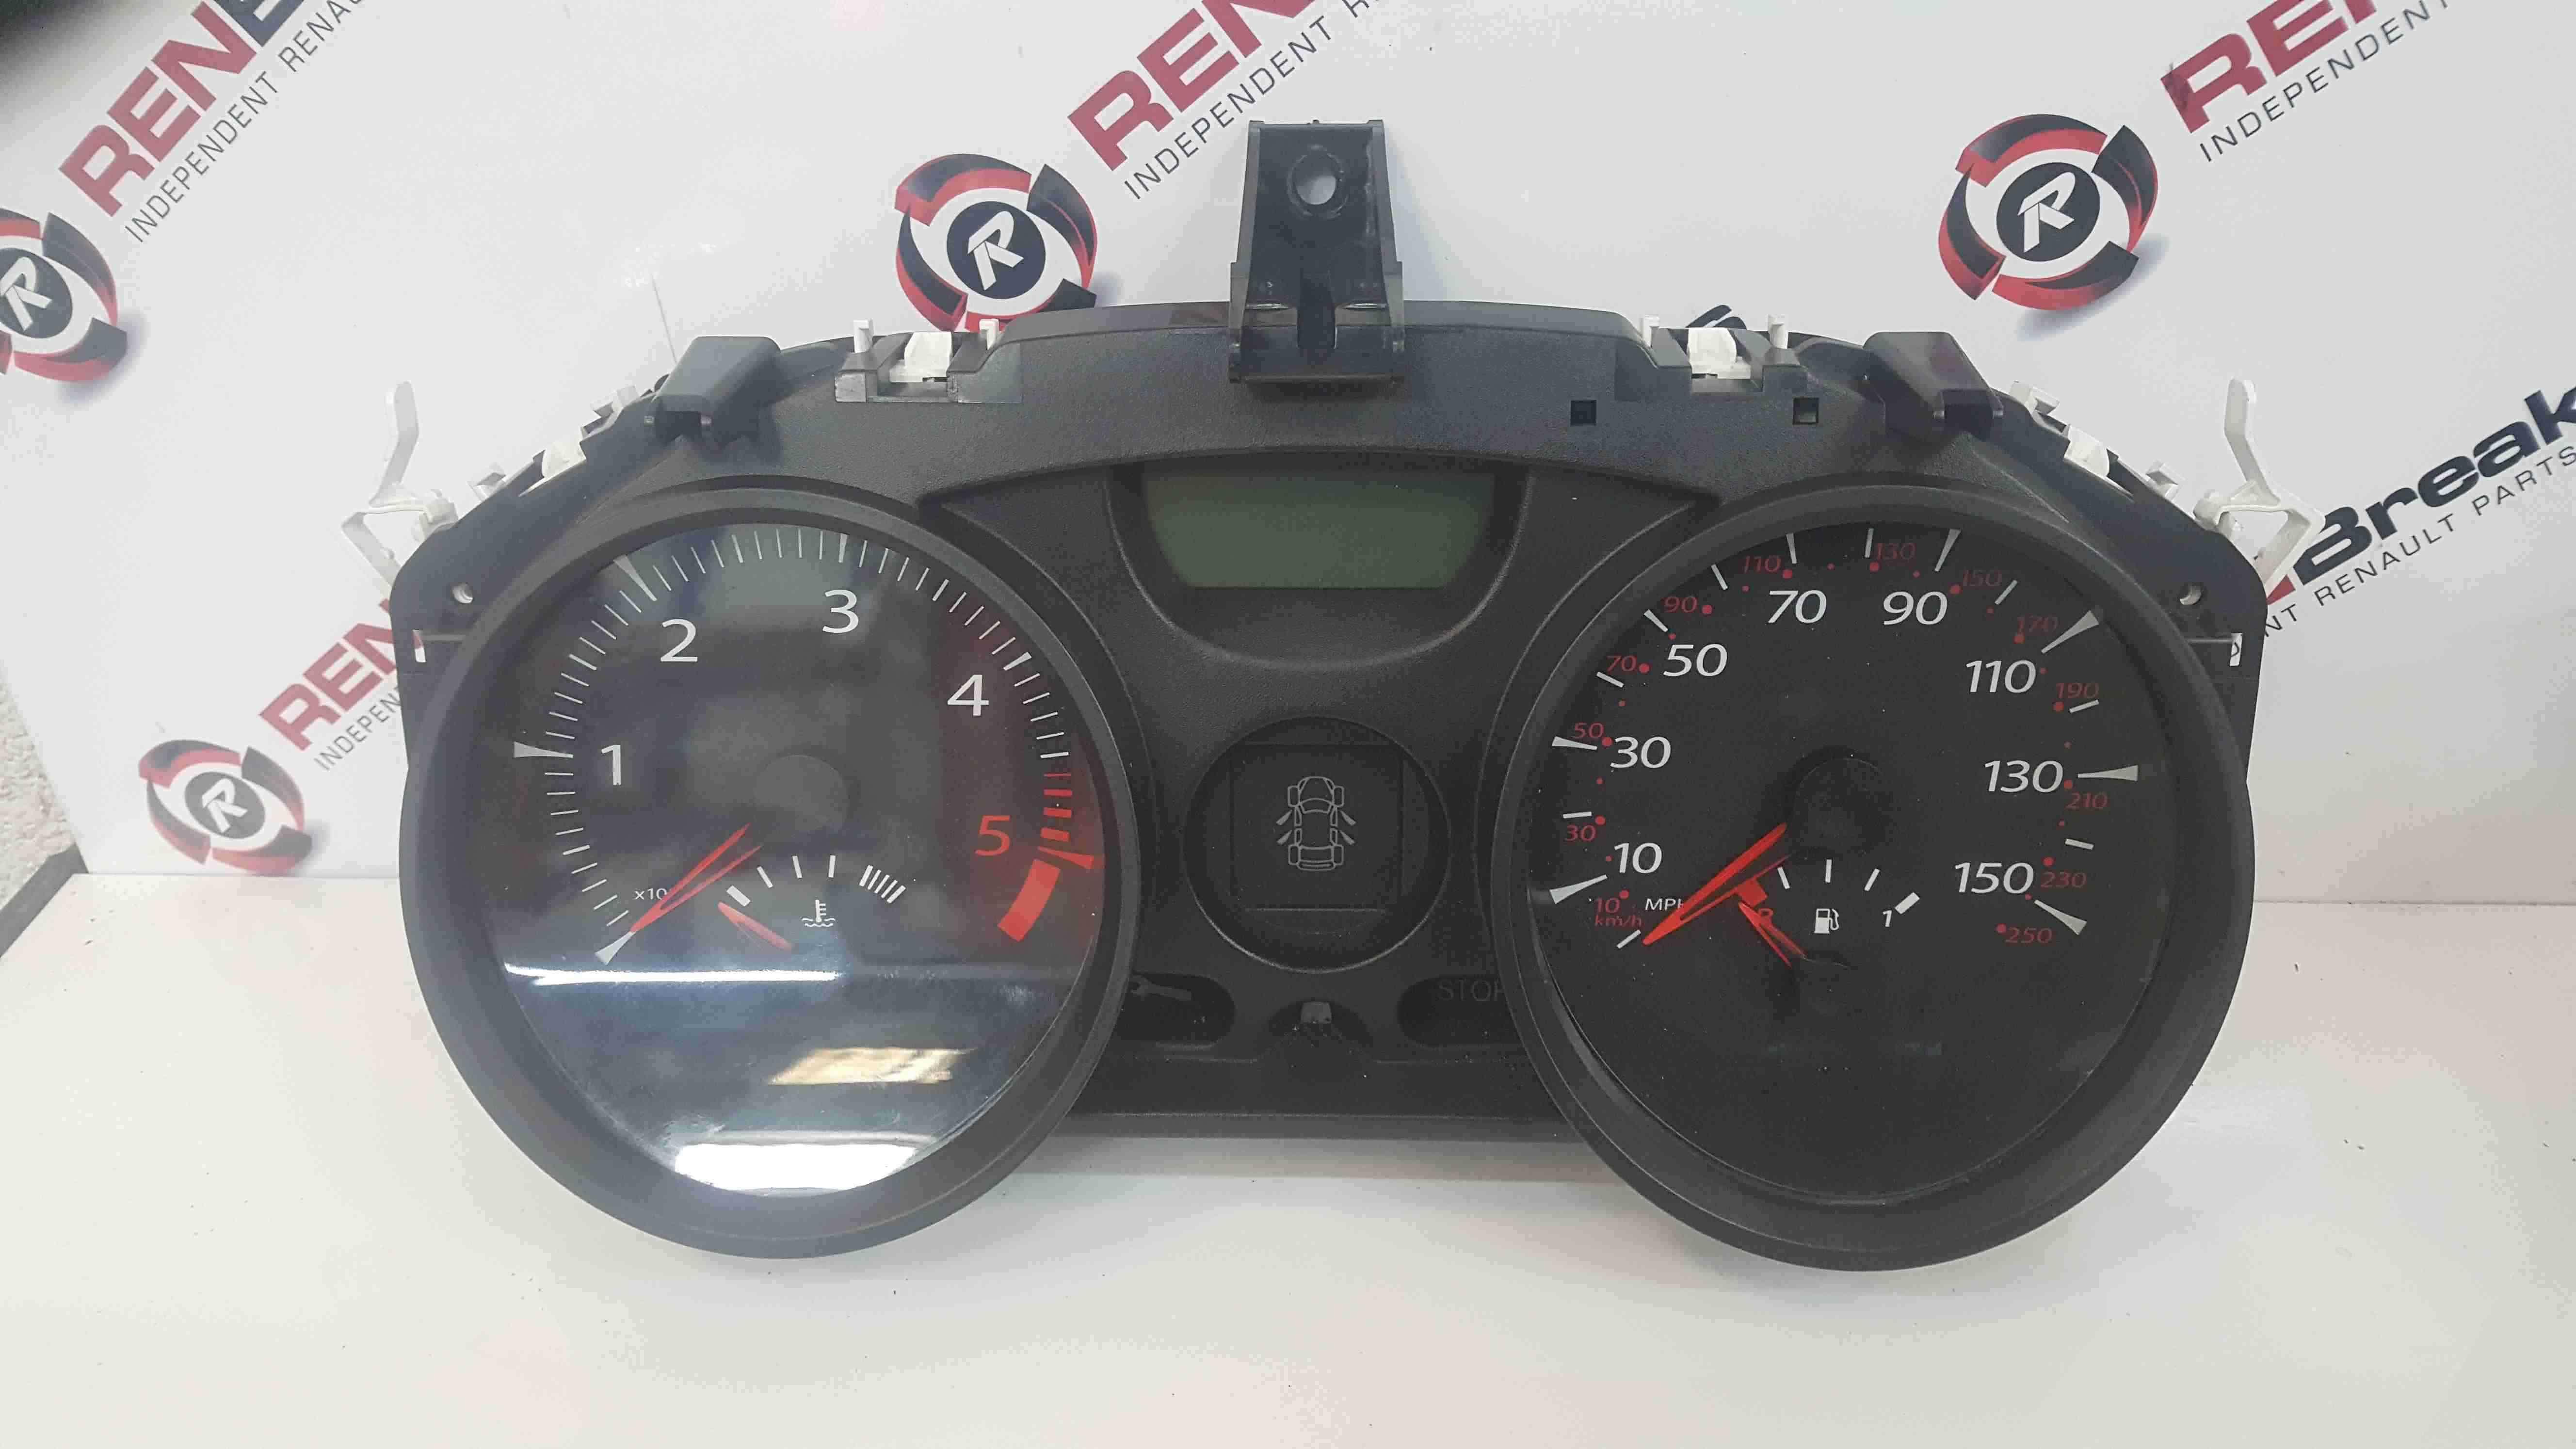 Renault Megane Convertible 2002-2008 Instrument Panel Dials Clocks 75000M